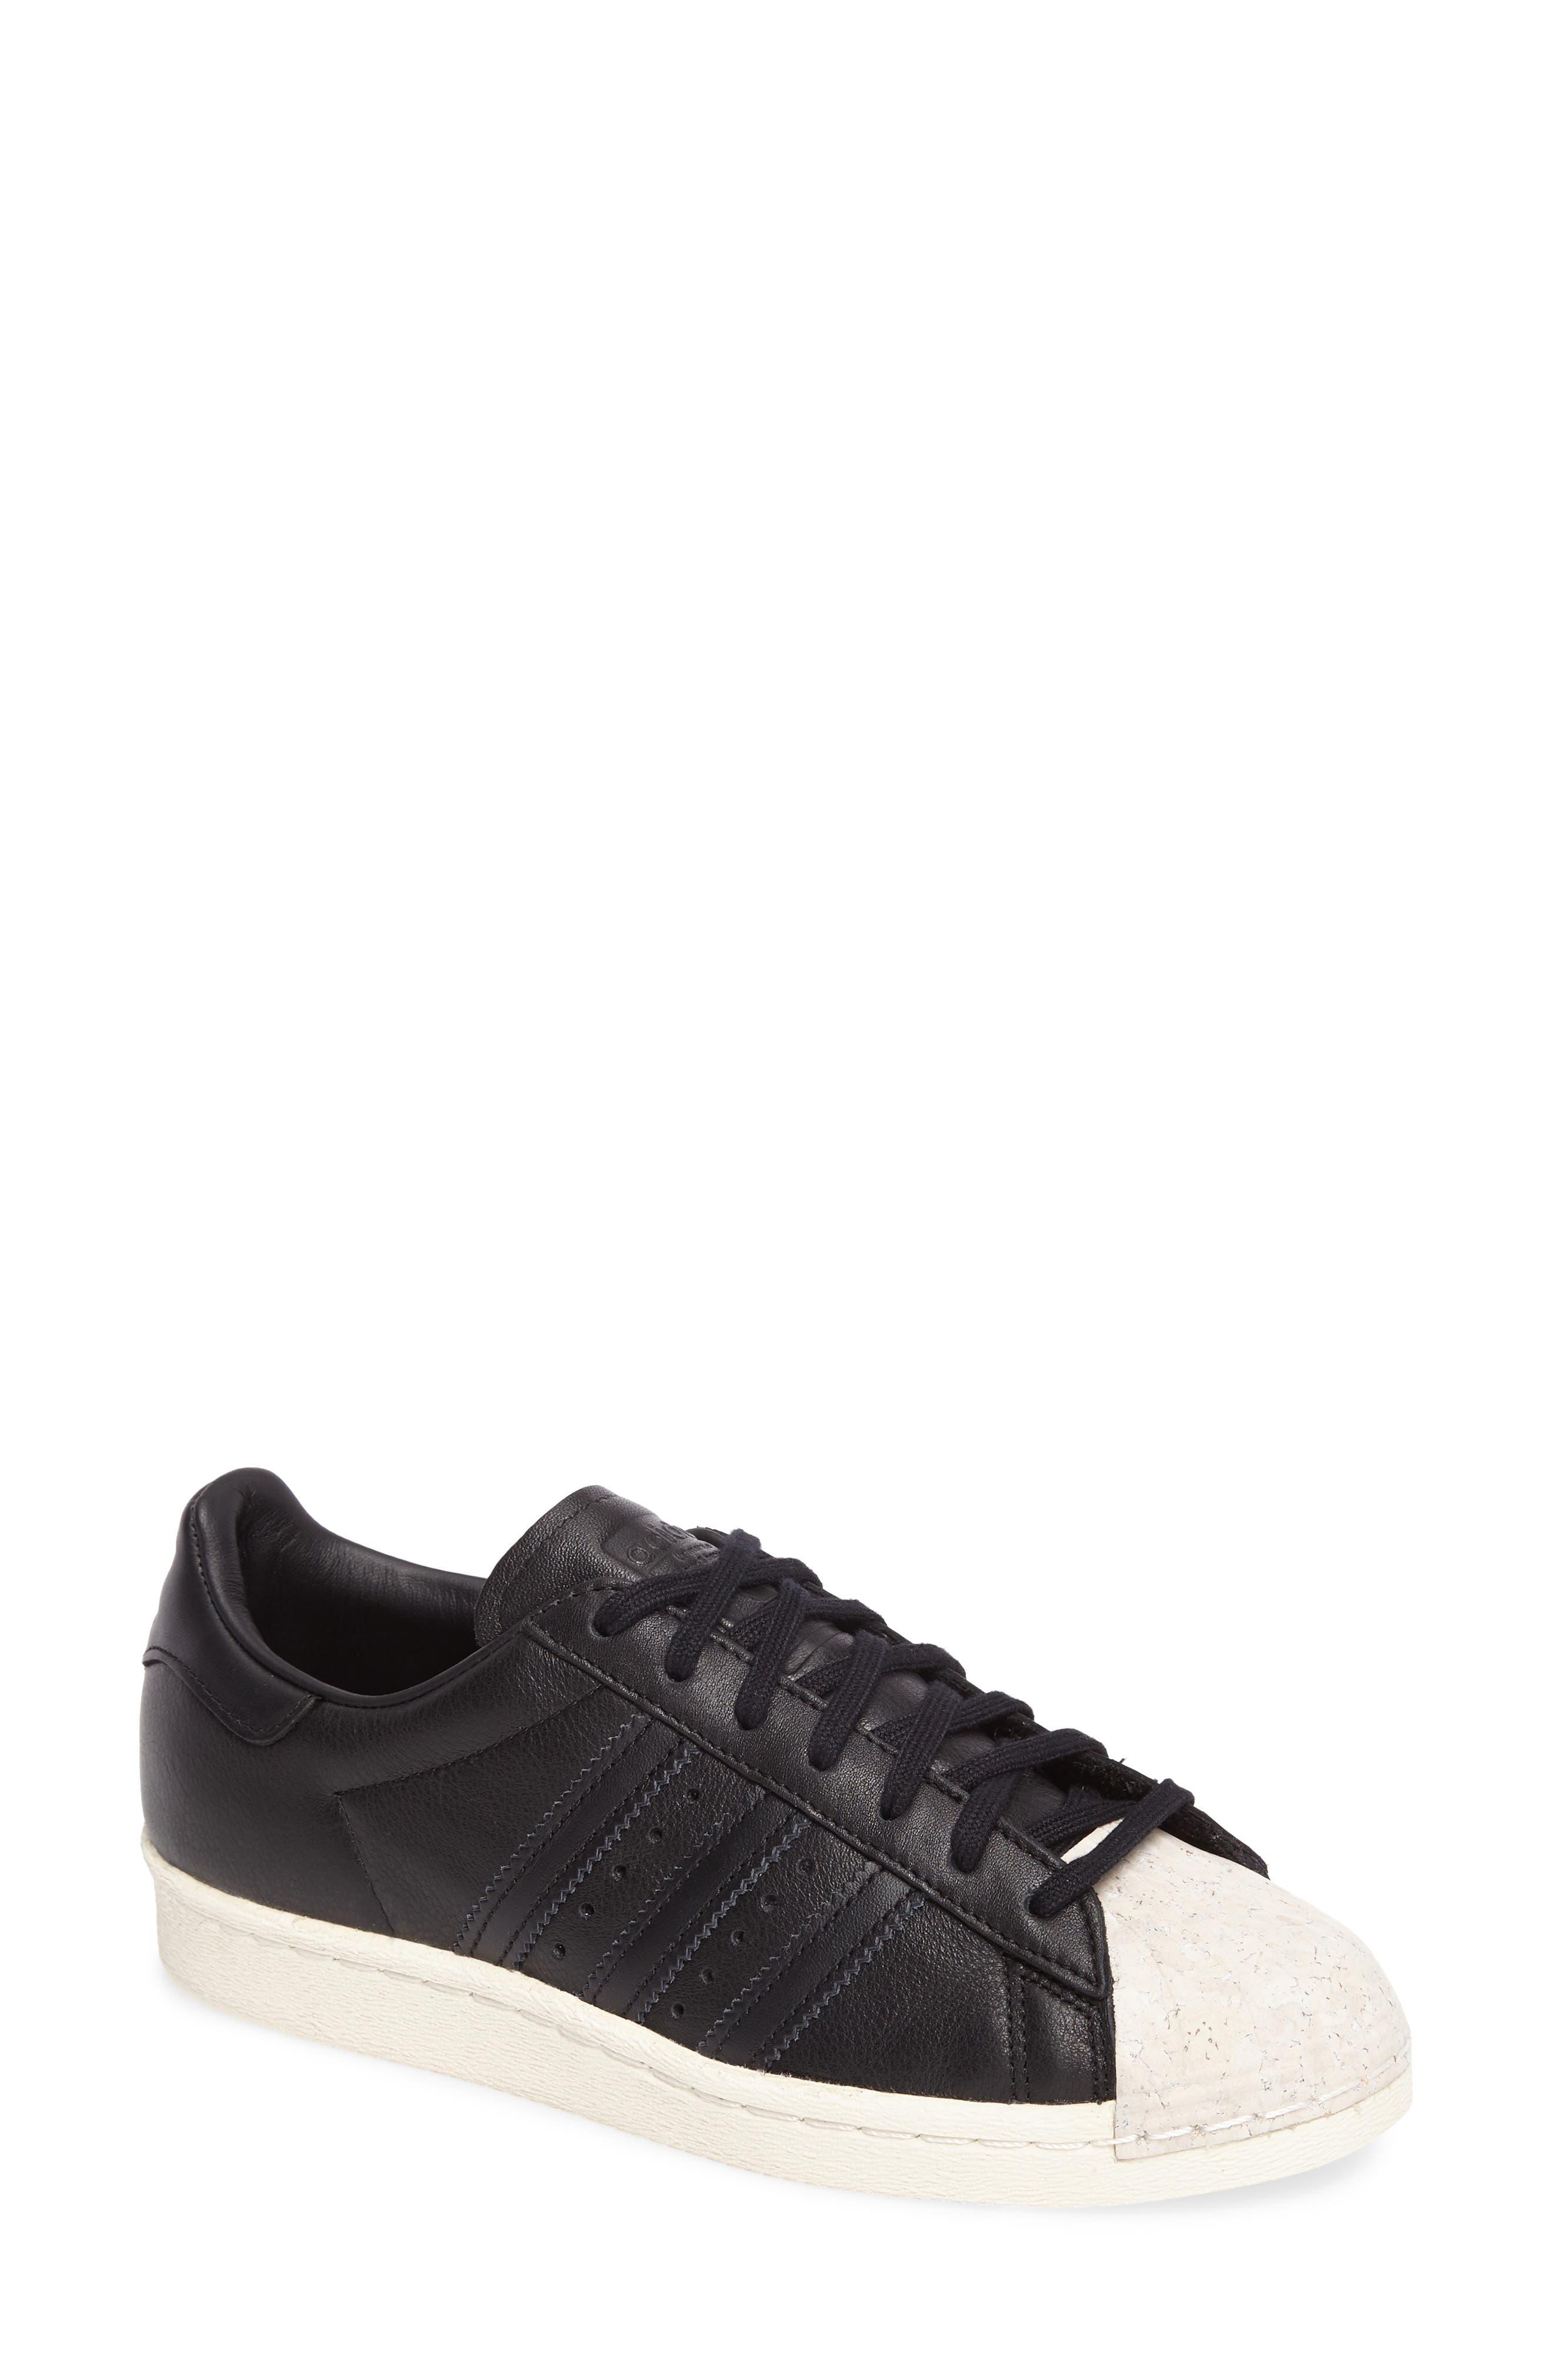 Superstar 80s Sneaker,                             Main thumbnail 1, color,                             001